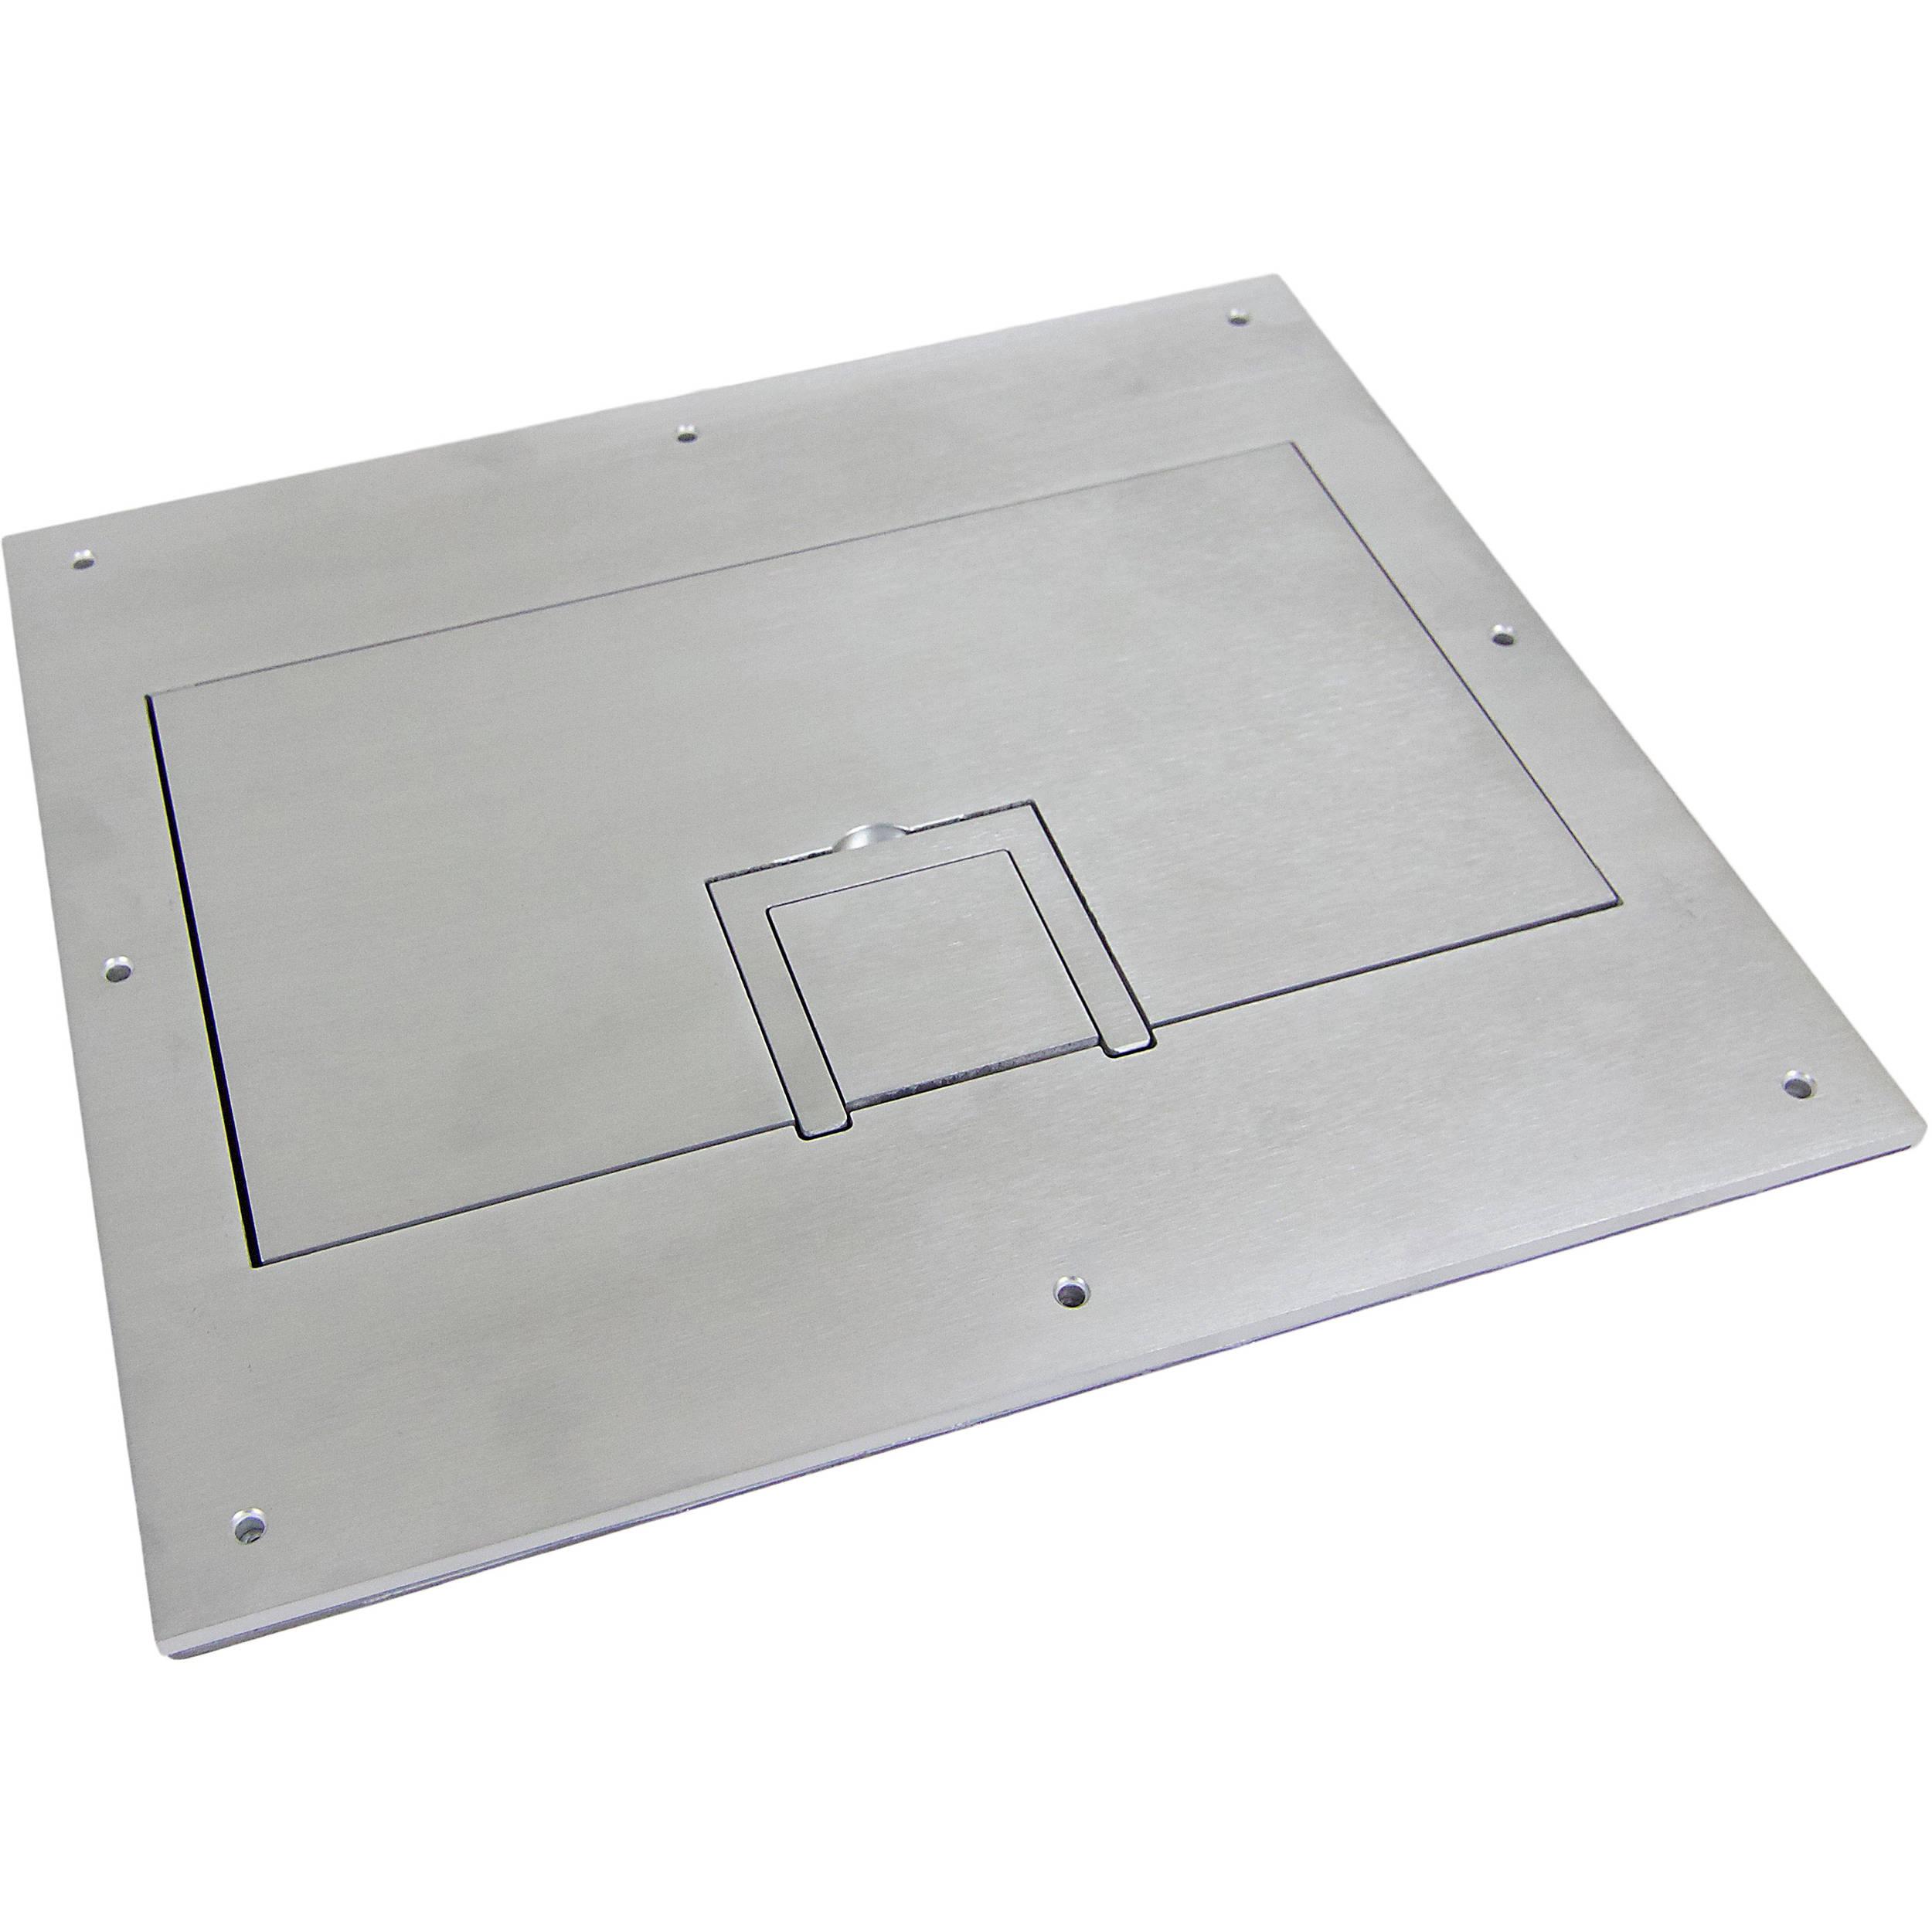 fsr solid aluminum cover for fl 600p floor box fl 600p sld alm c. Black Bedroom Furniture Sets. Home Design Ideas